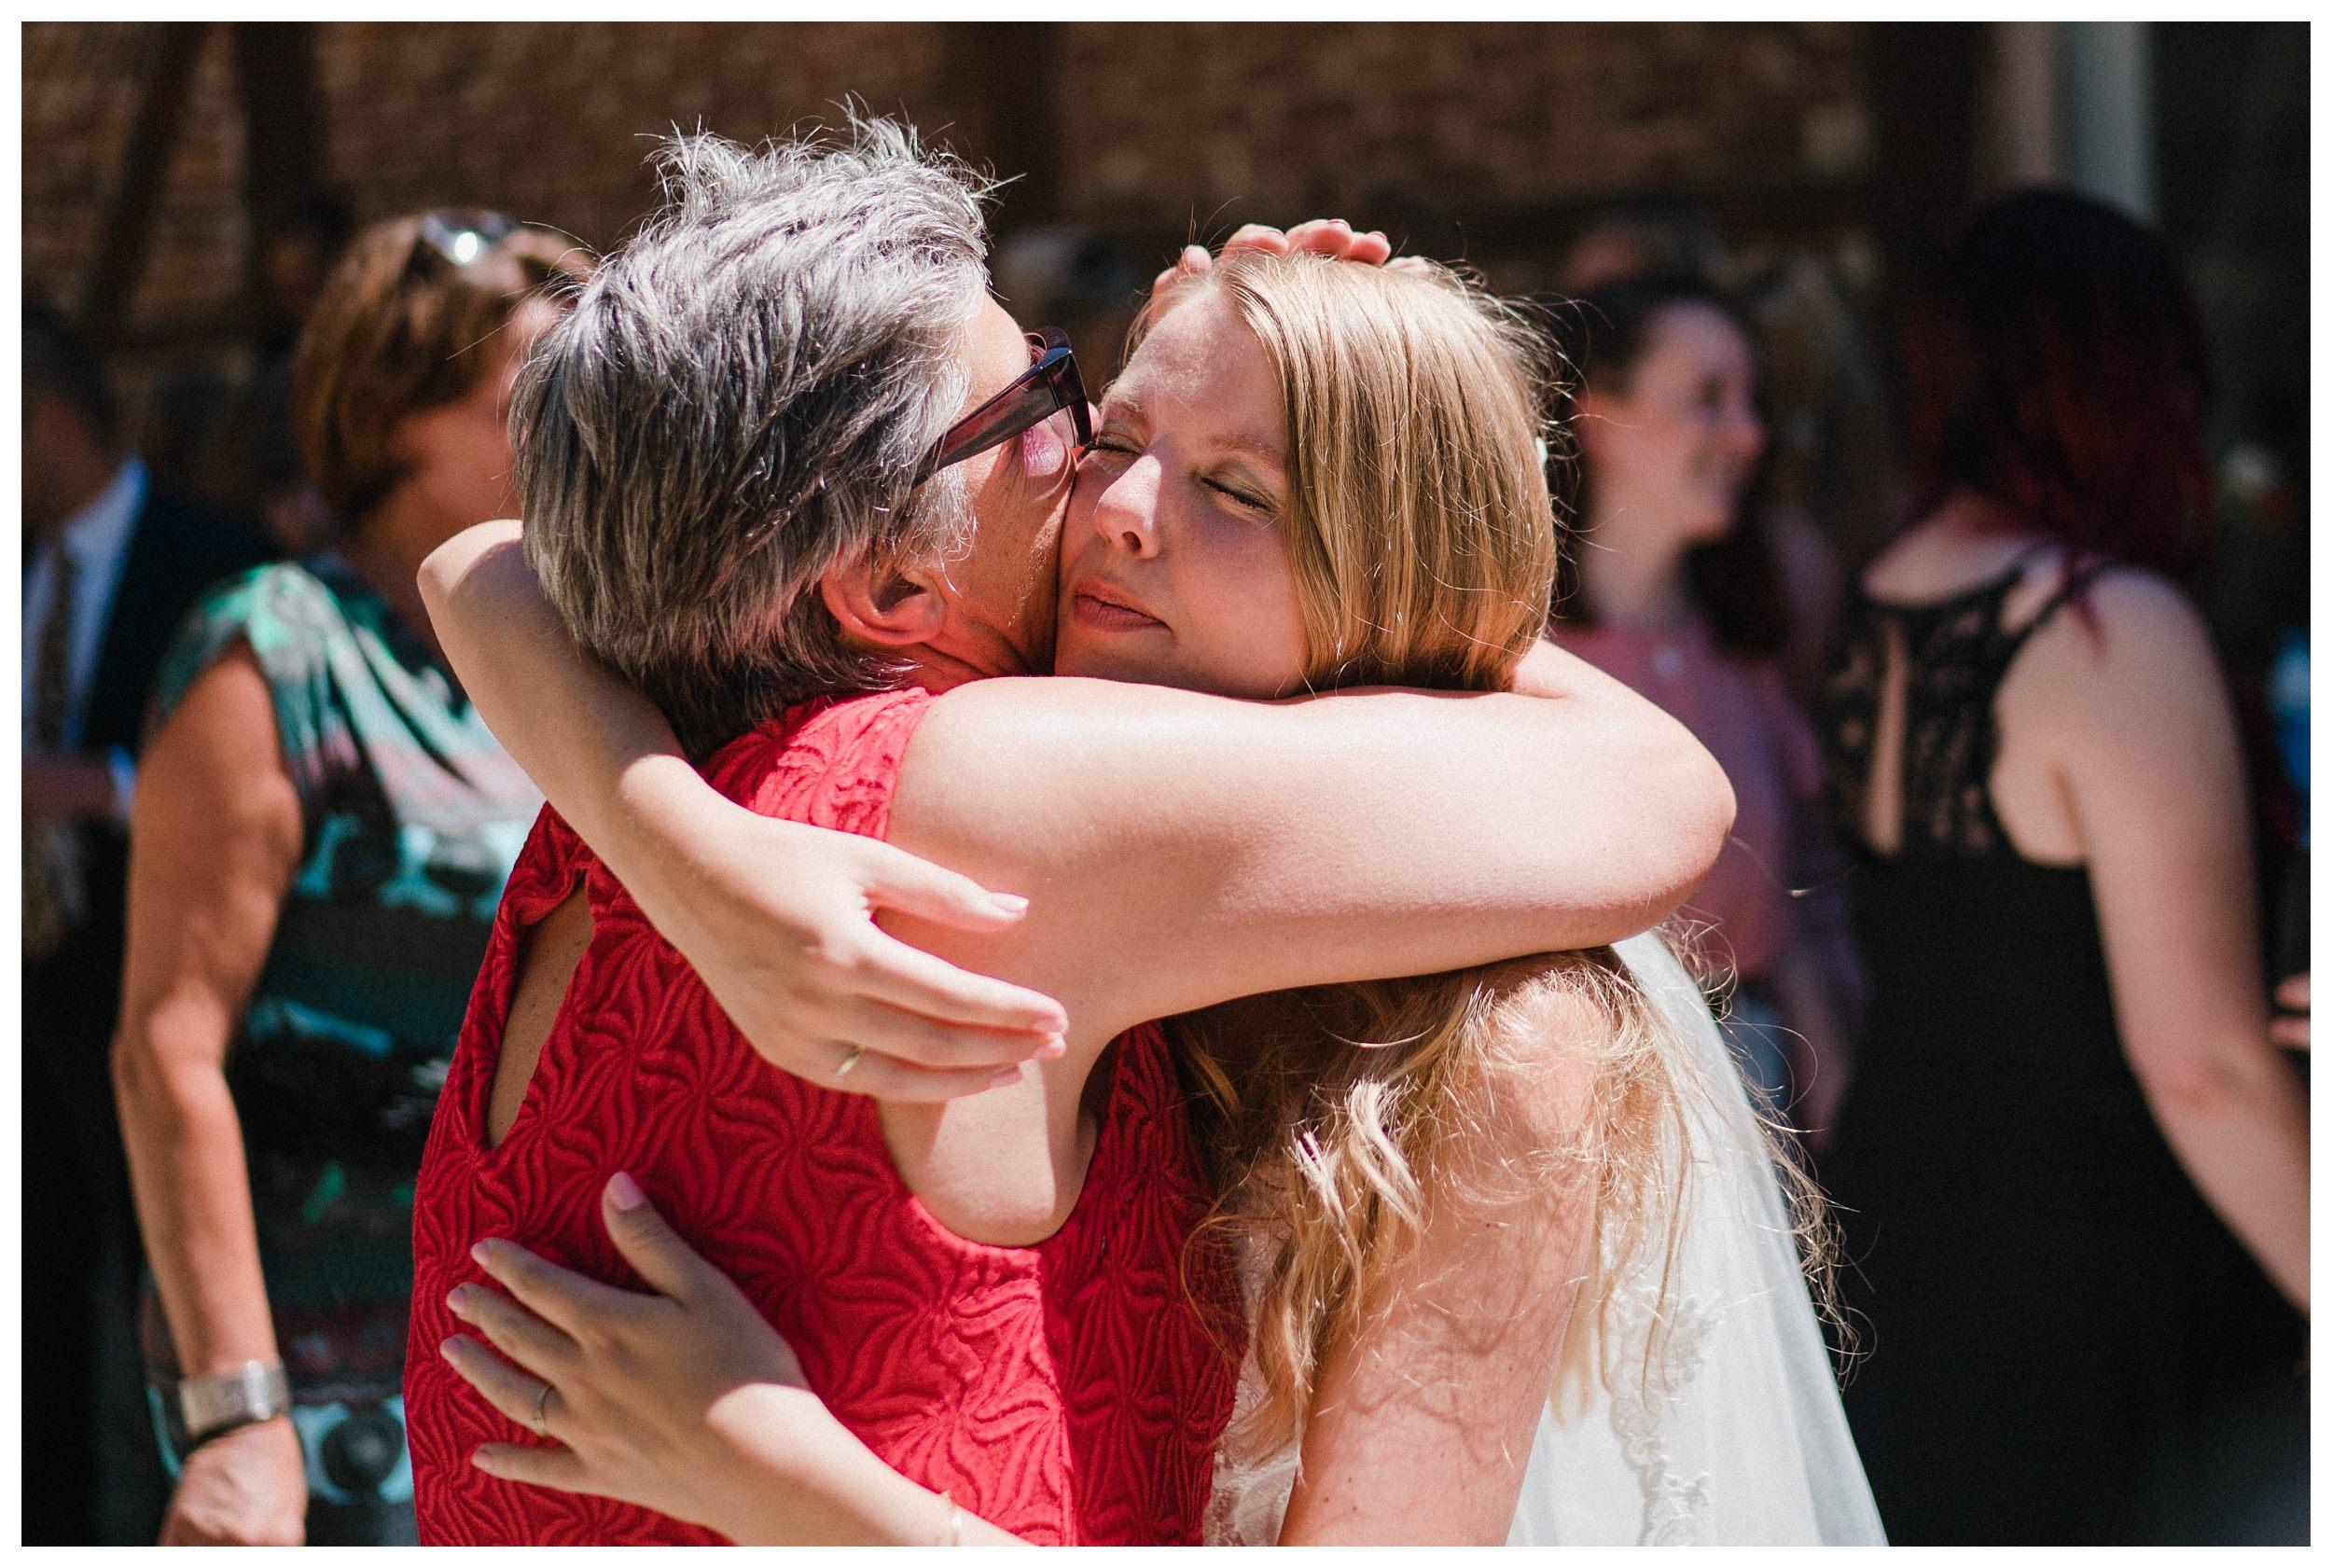 huwelijksfotograaf bruidsfotograaf destinationwedding huwelijksfotografie in ardennen nederland (71).jpg